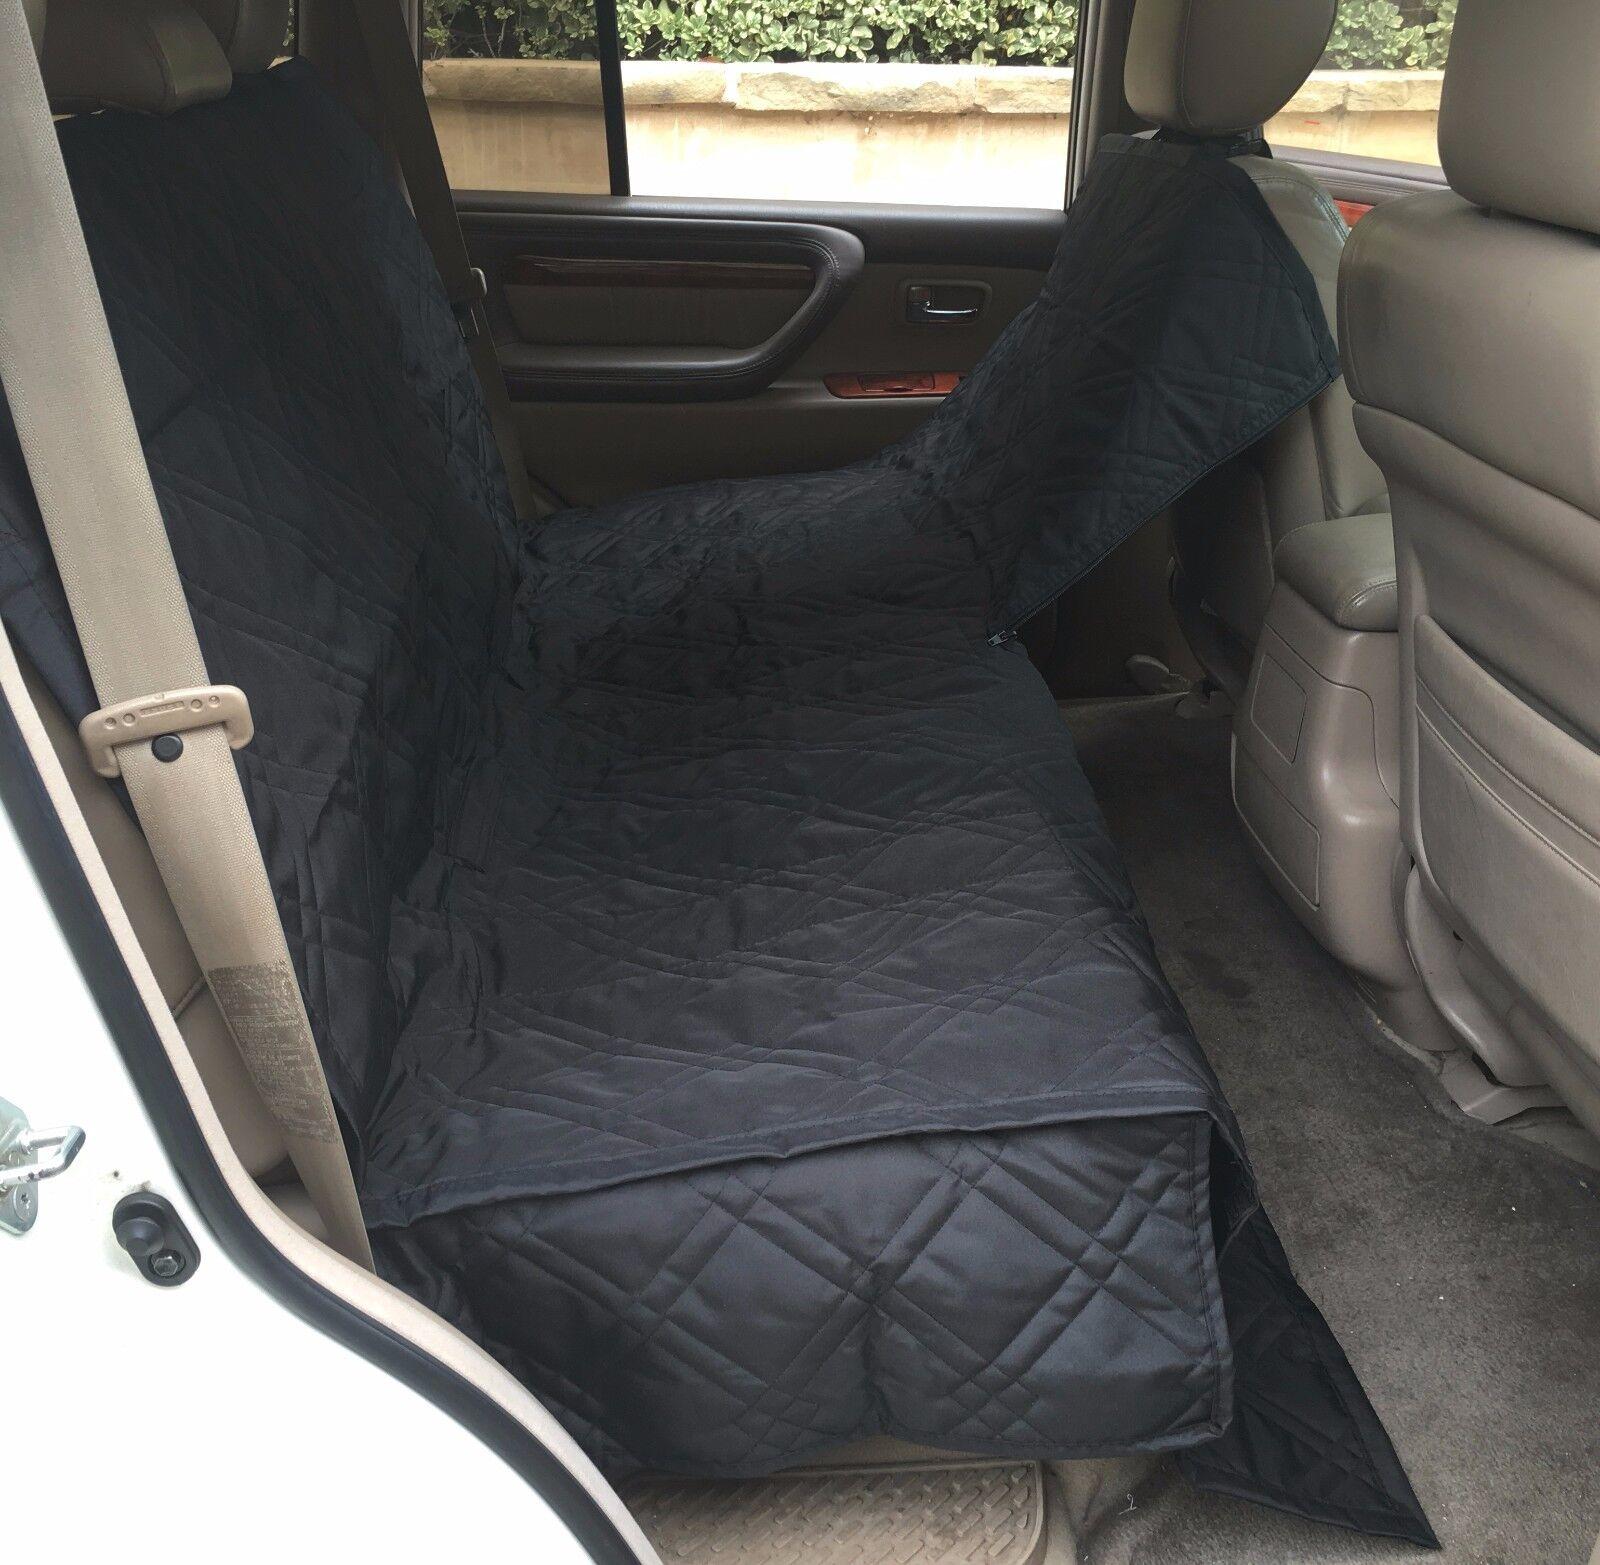 Pet Dog Cat Car Seat Universal Hammock Cover Fit Car Van